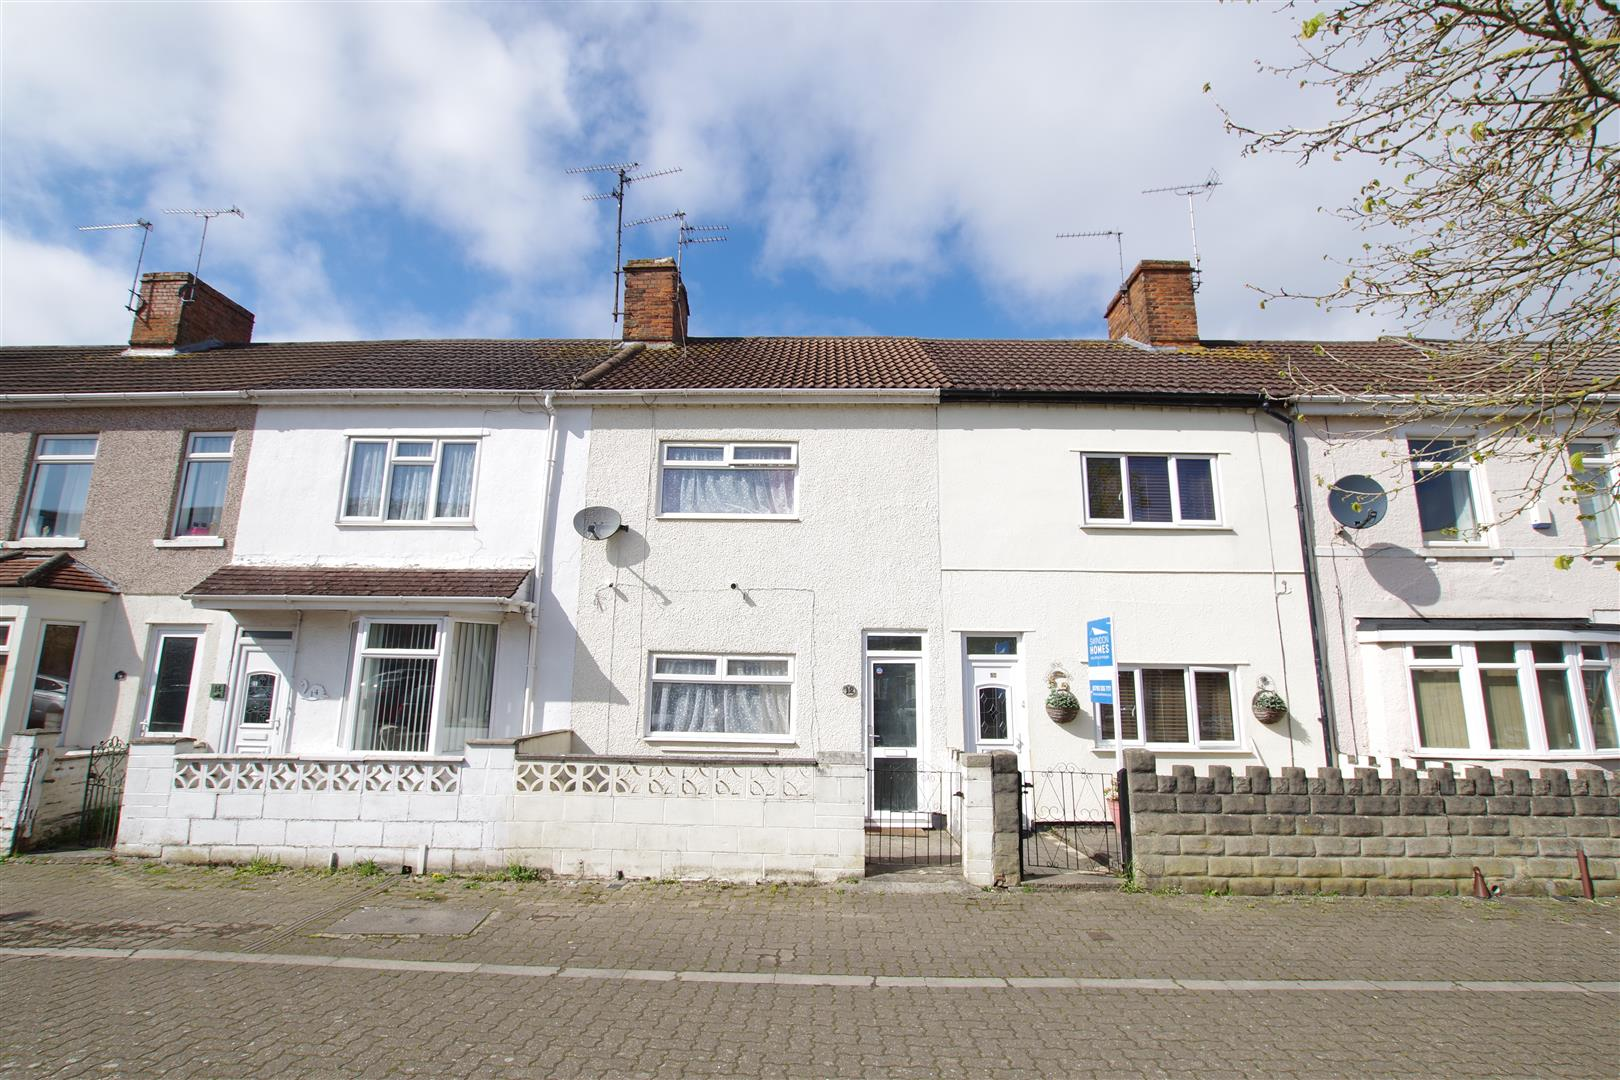 Morris Street, Rodbourne, Swindon